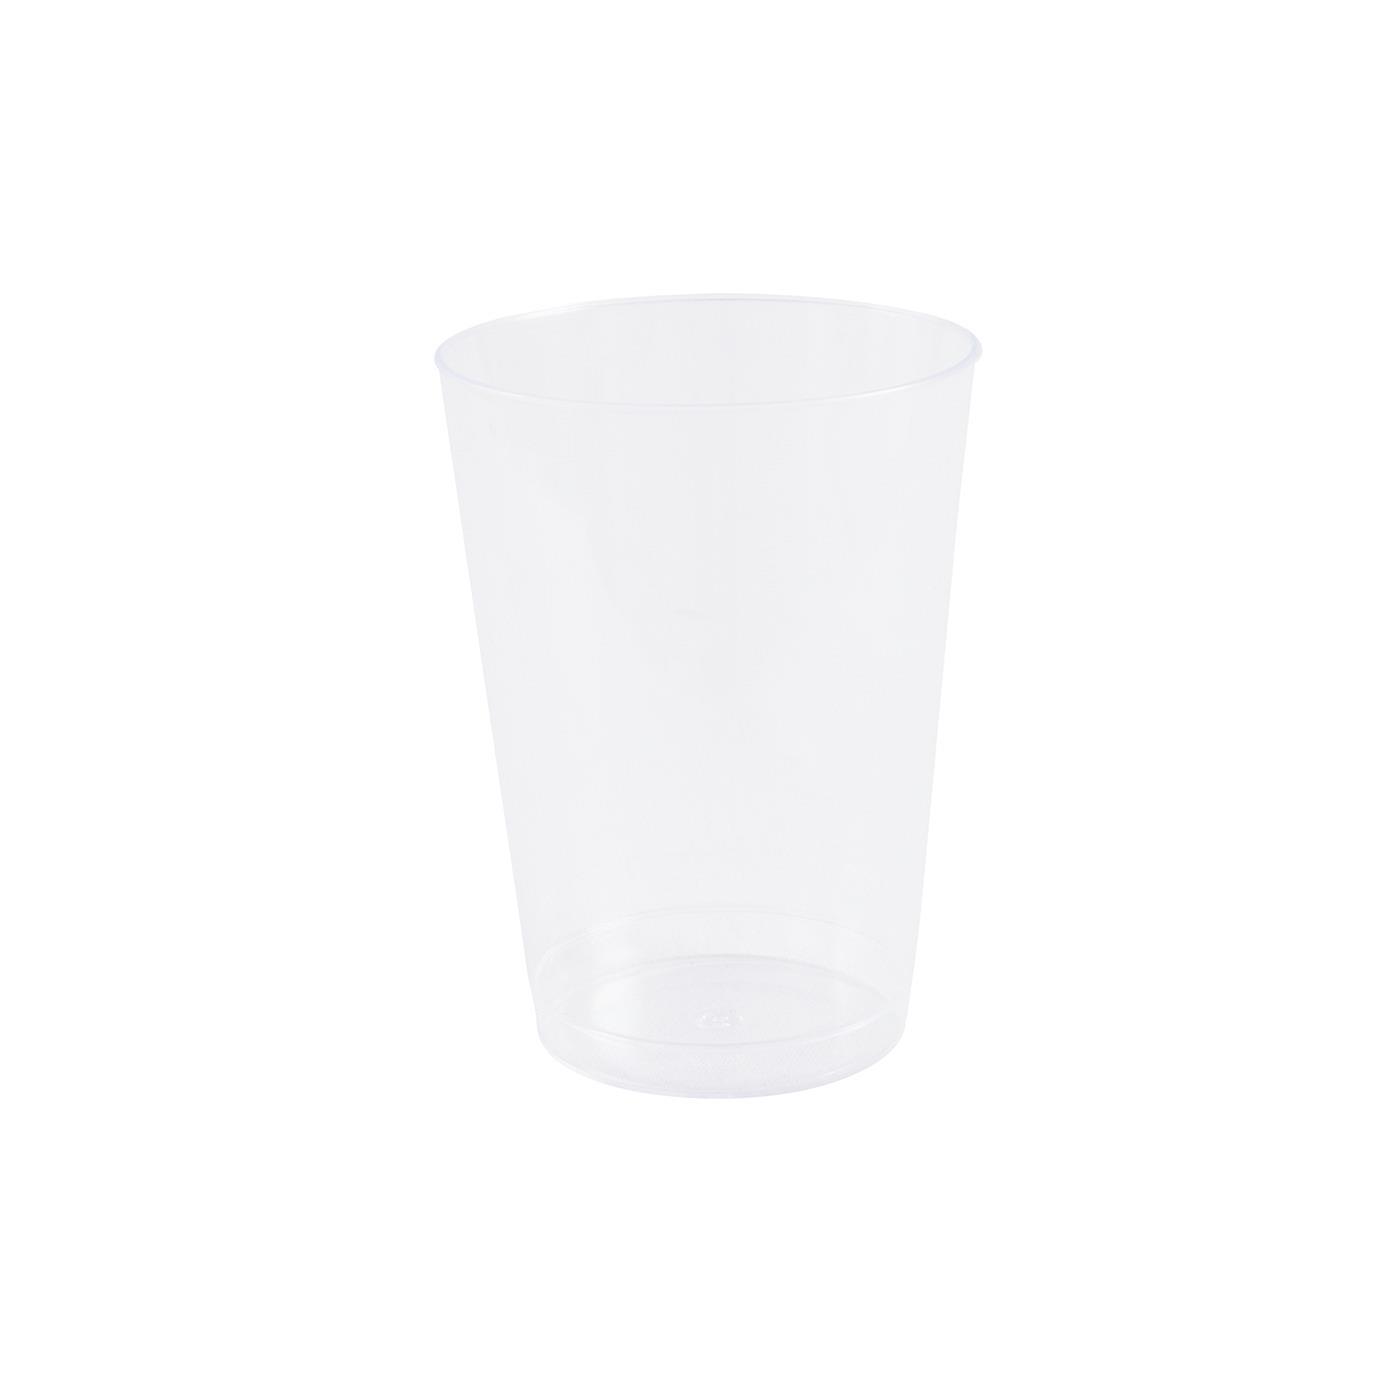 Plastic Cup - Standard